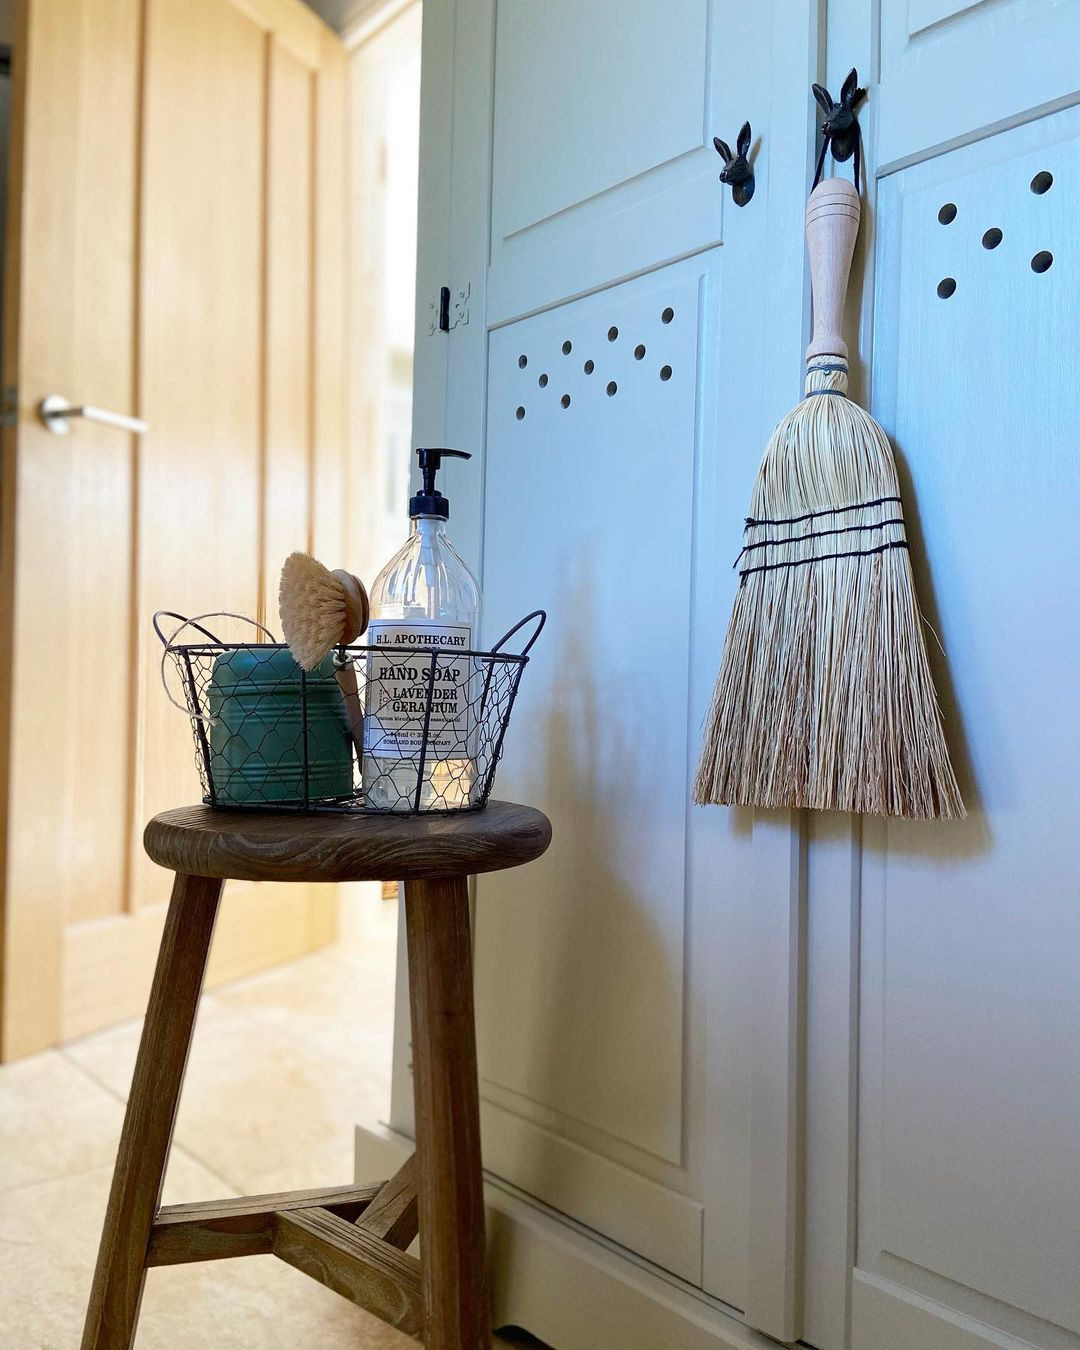 wire-basket-bathroom-decor